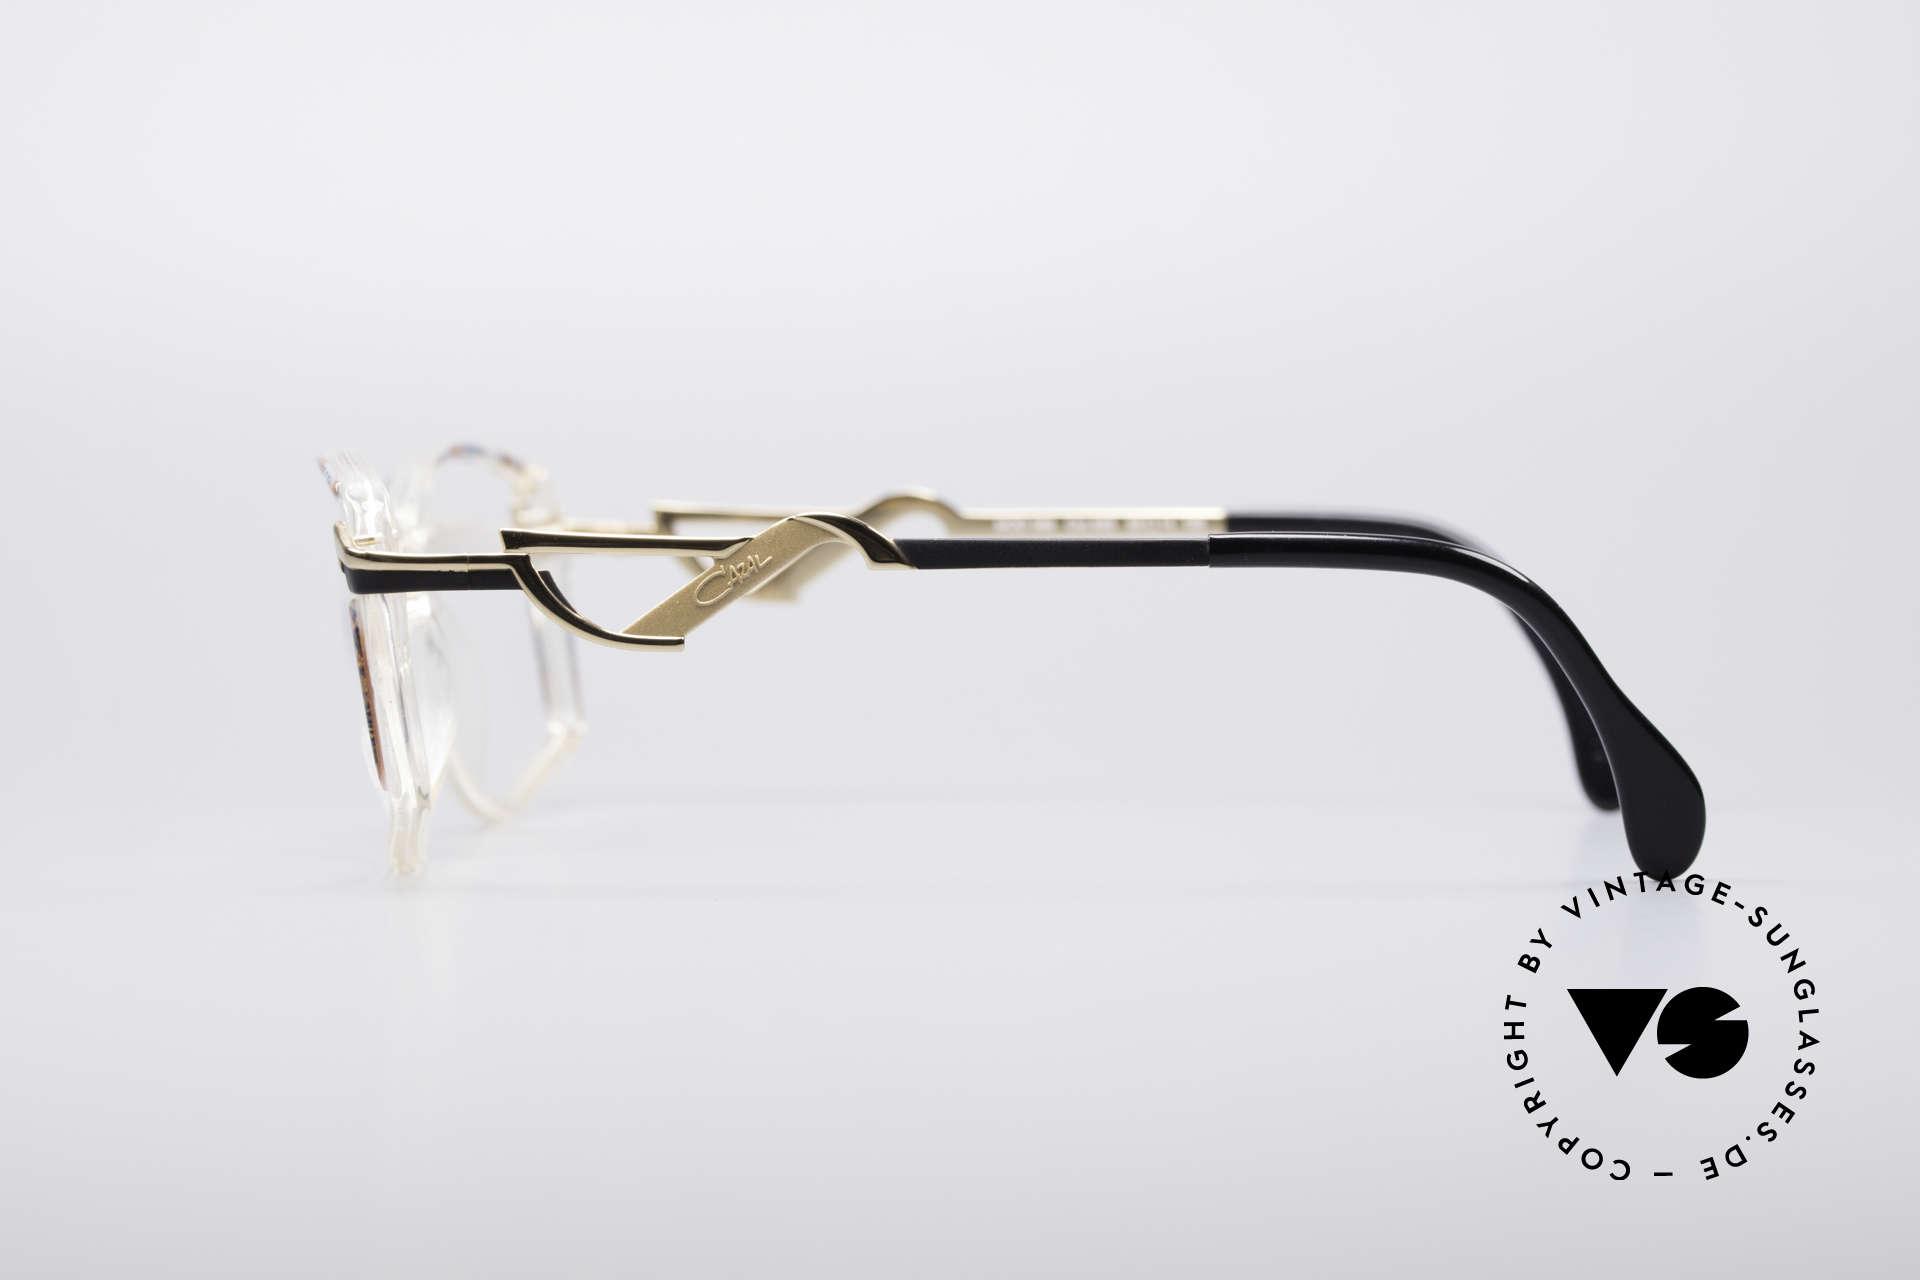 Cazal 369 90's Ladies Designer Glasses, never used (like all our rare VINTAGE CAZAL eyewear), Made for Women